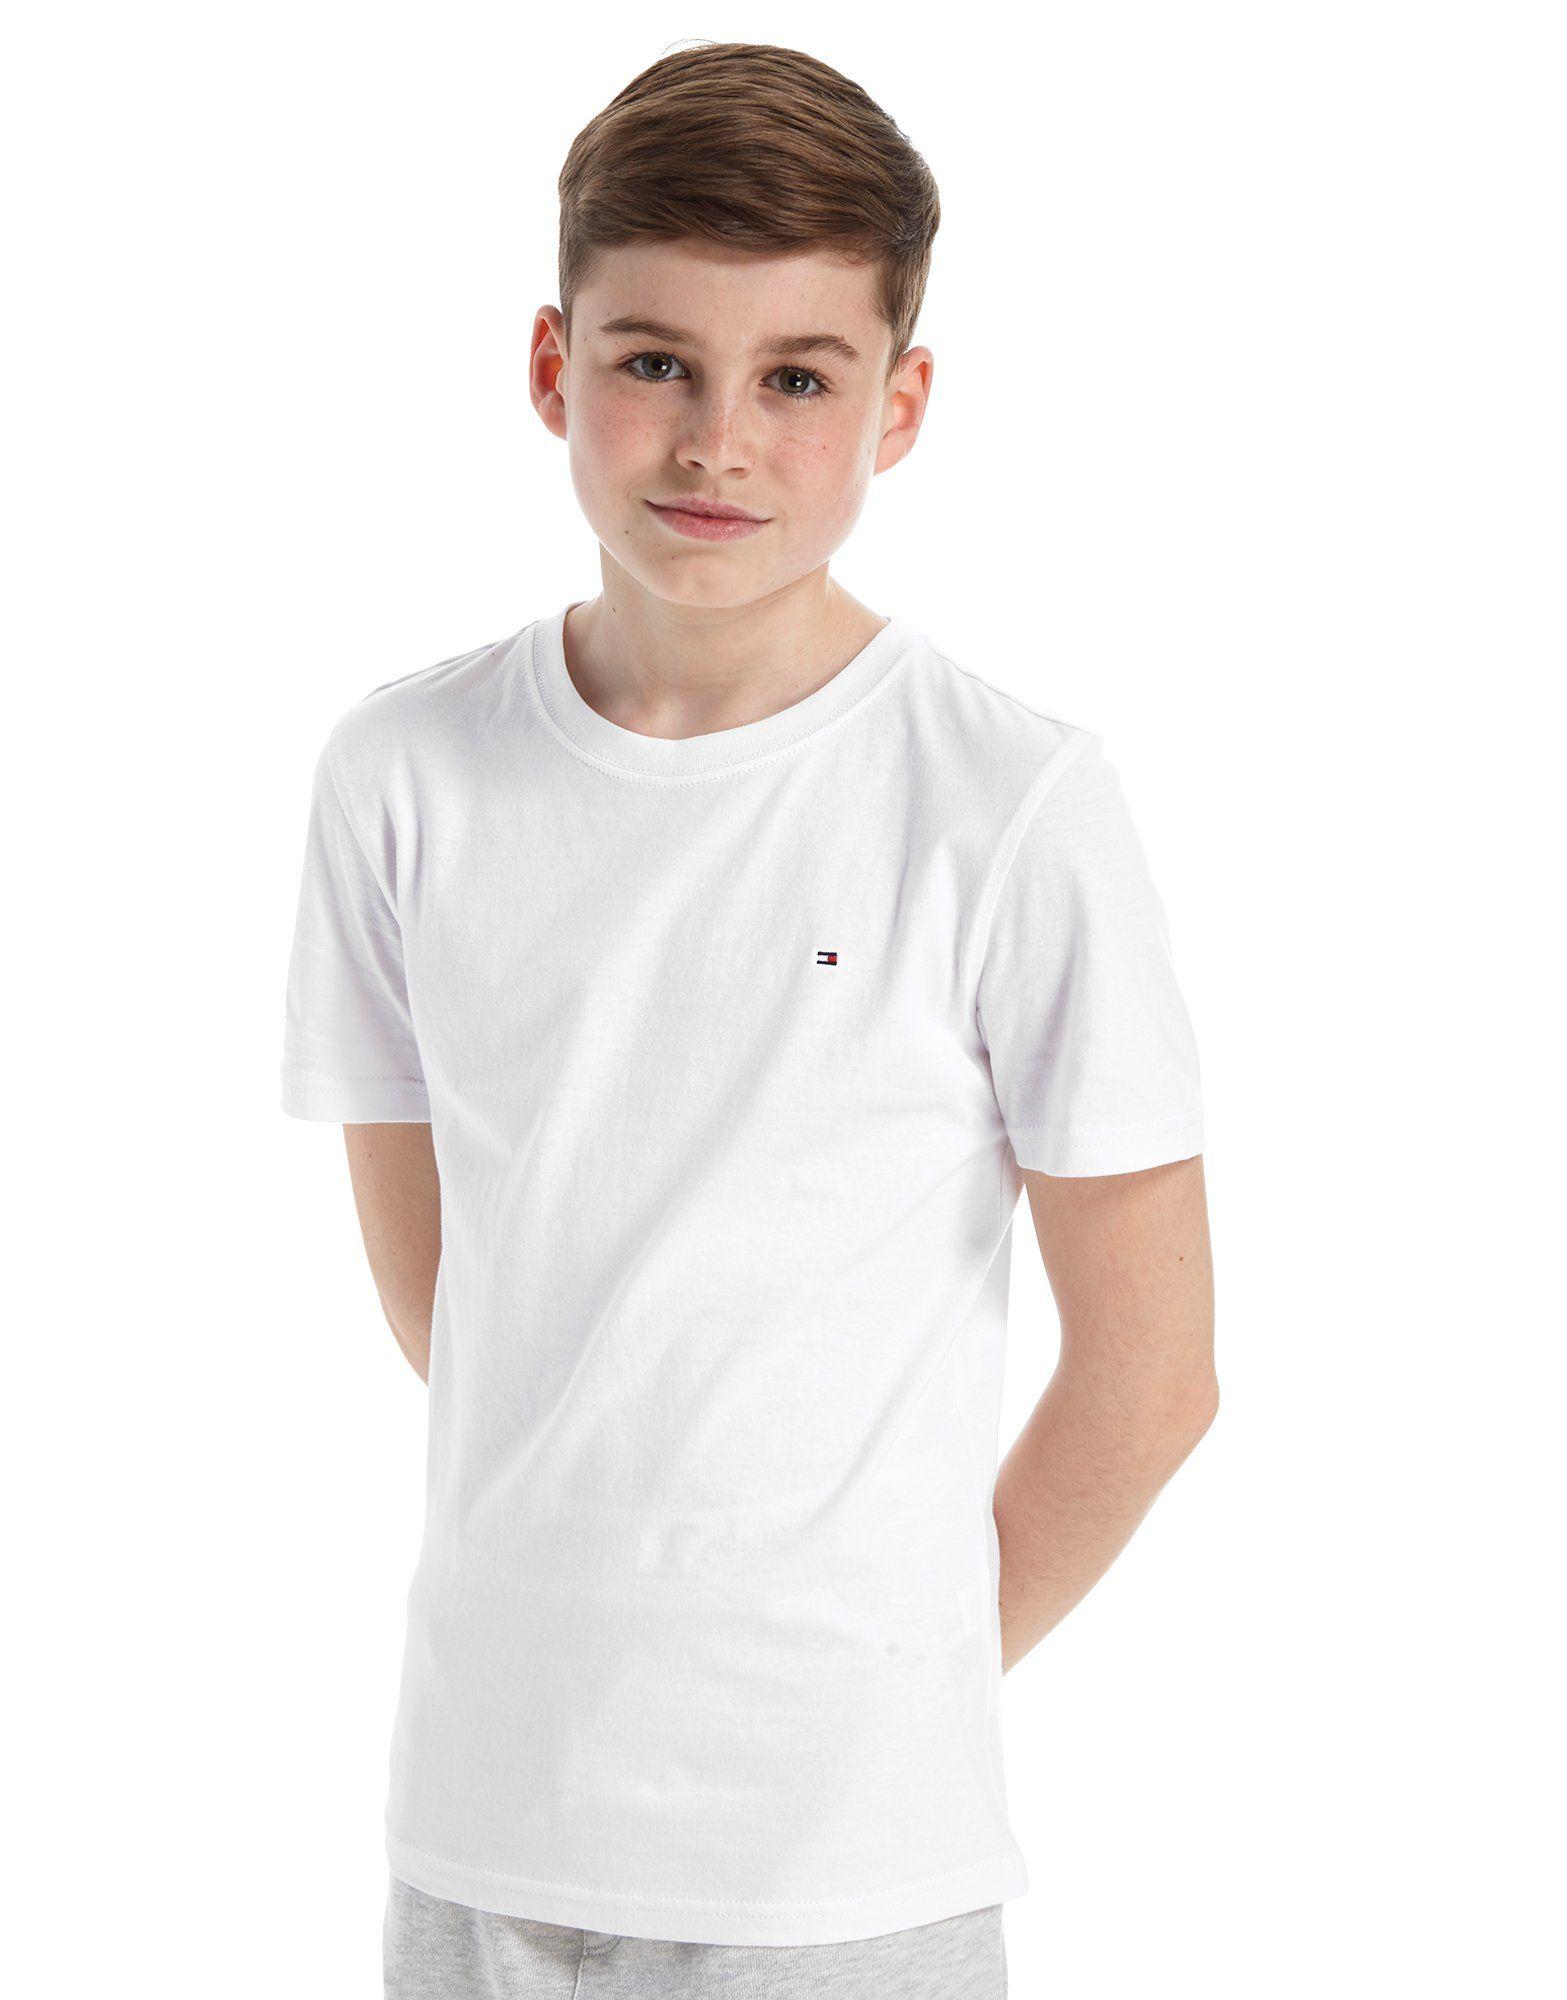 389f528e9 Tommy Hilfiger Small Flag T-Shirt Junior